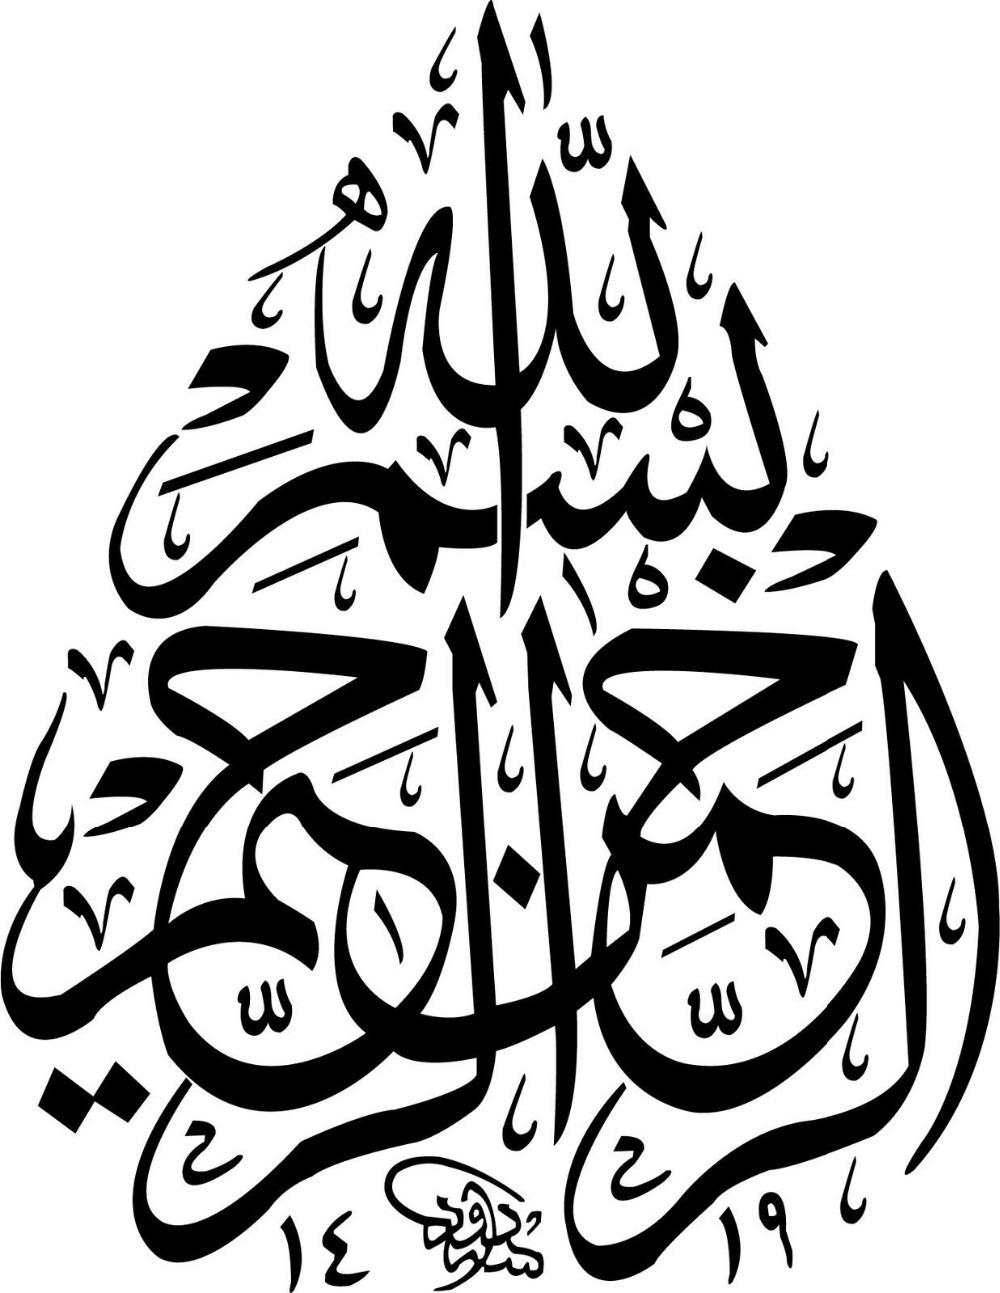 Arabic Calligraphy Quran Arabic Calligraphy Islam